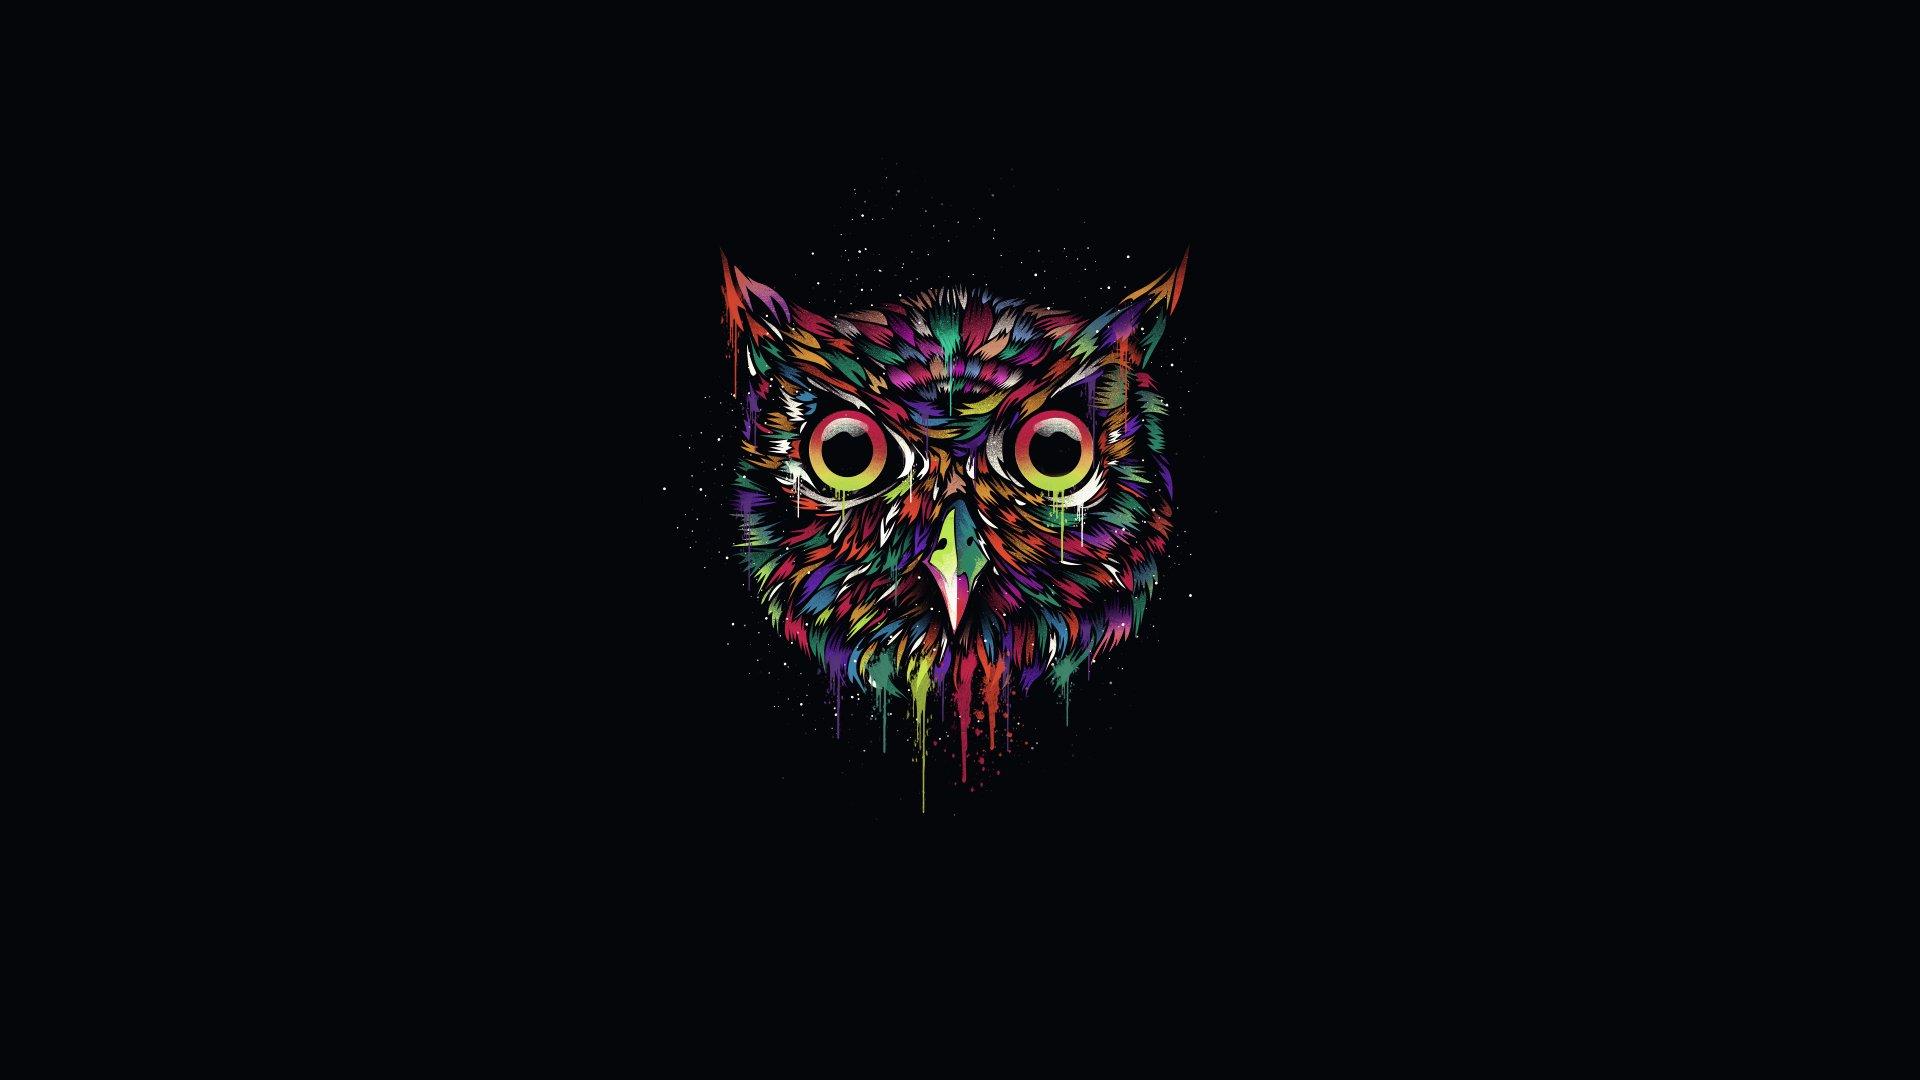 Wallpaper Owl Strix Asus Hd 4k Creative Graphics 10199: 30+ Beautiful Minimalist Desktop Wallpapers